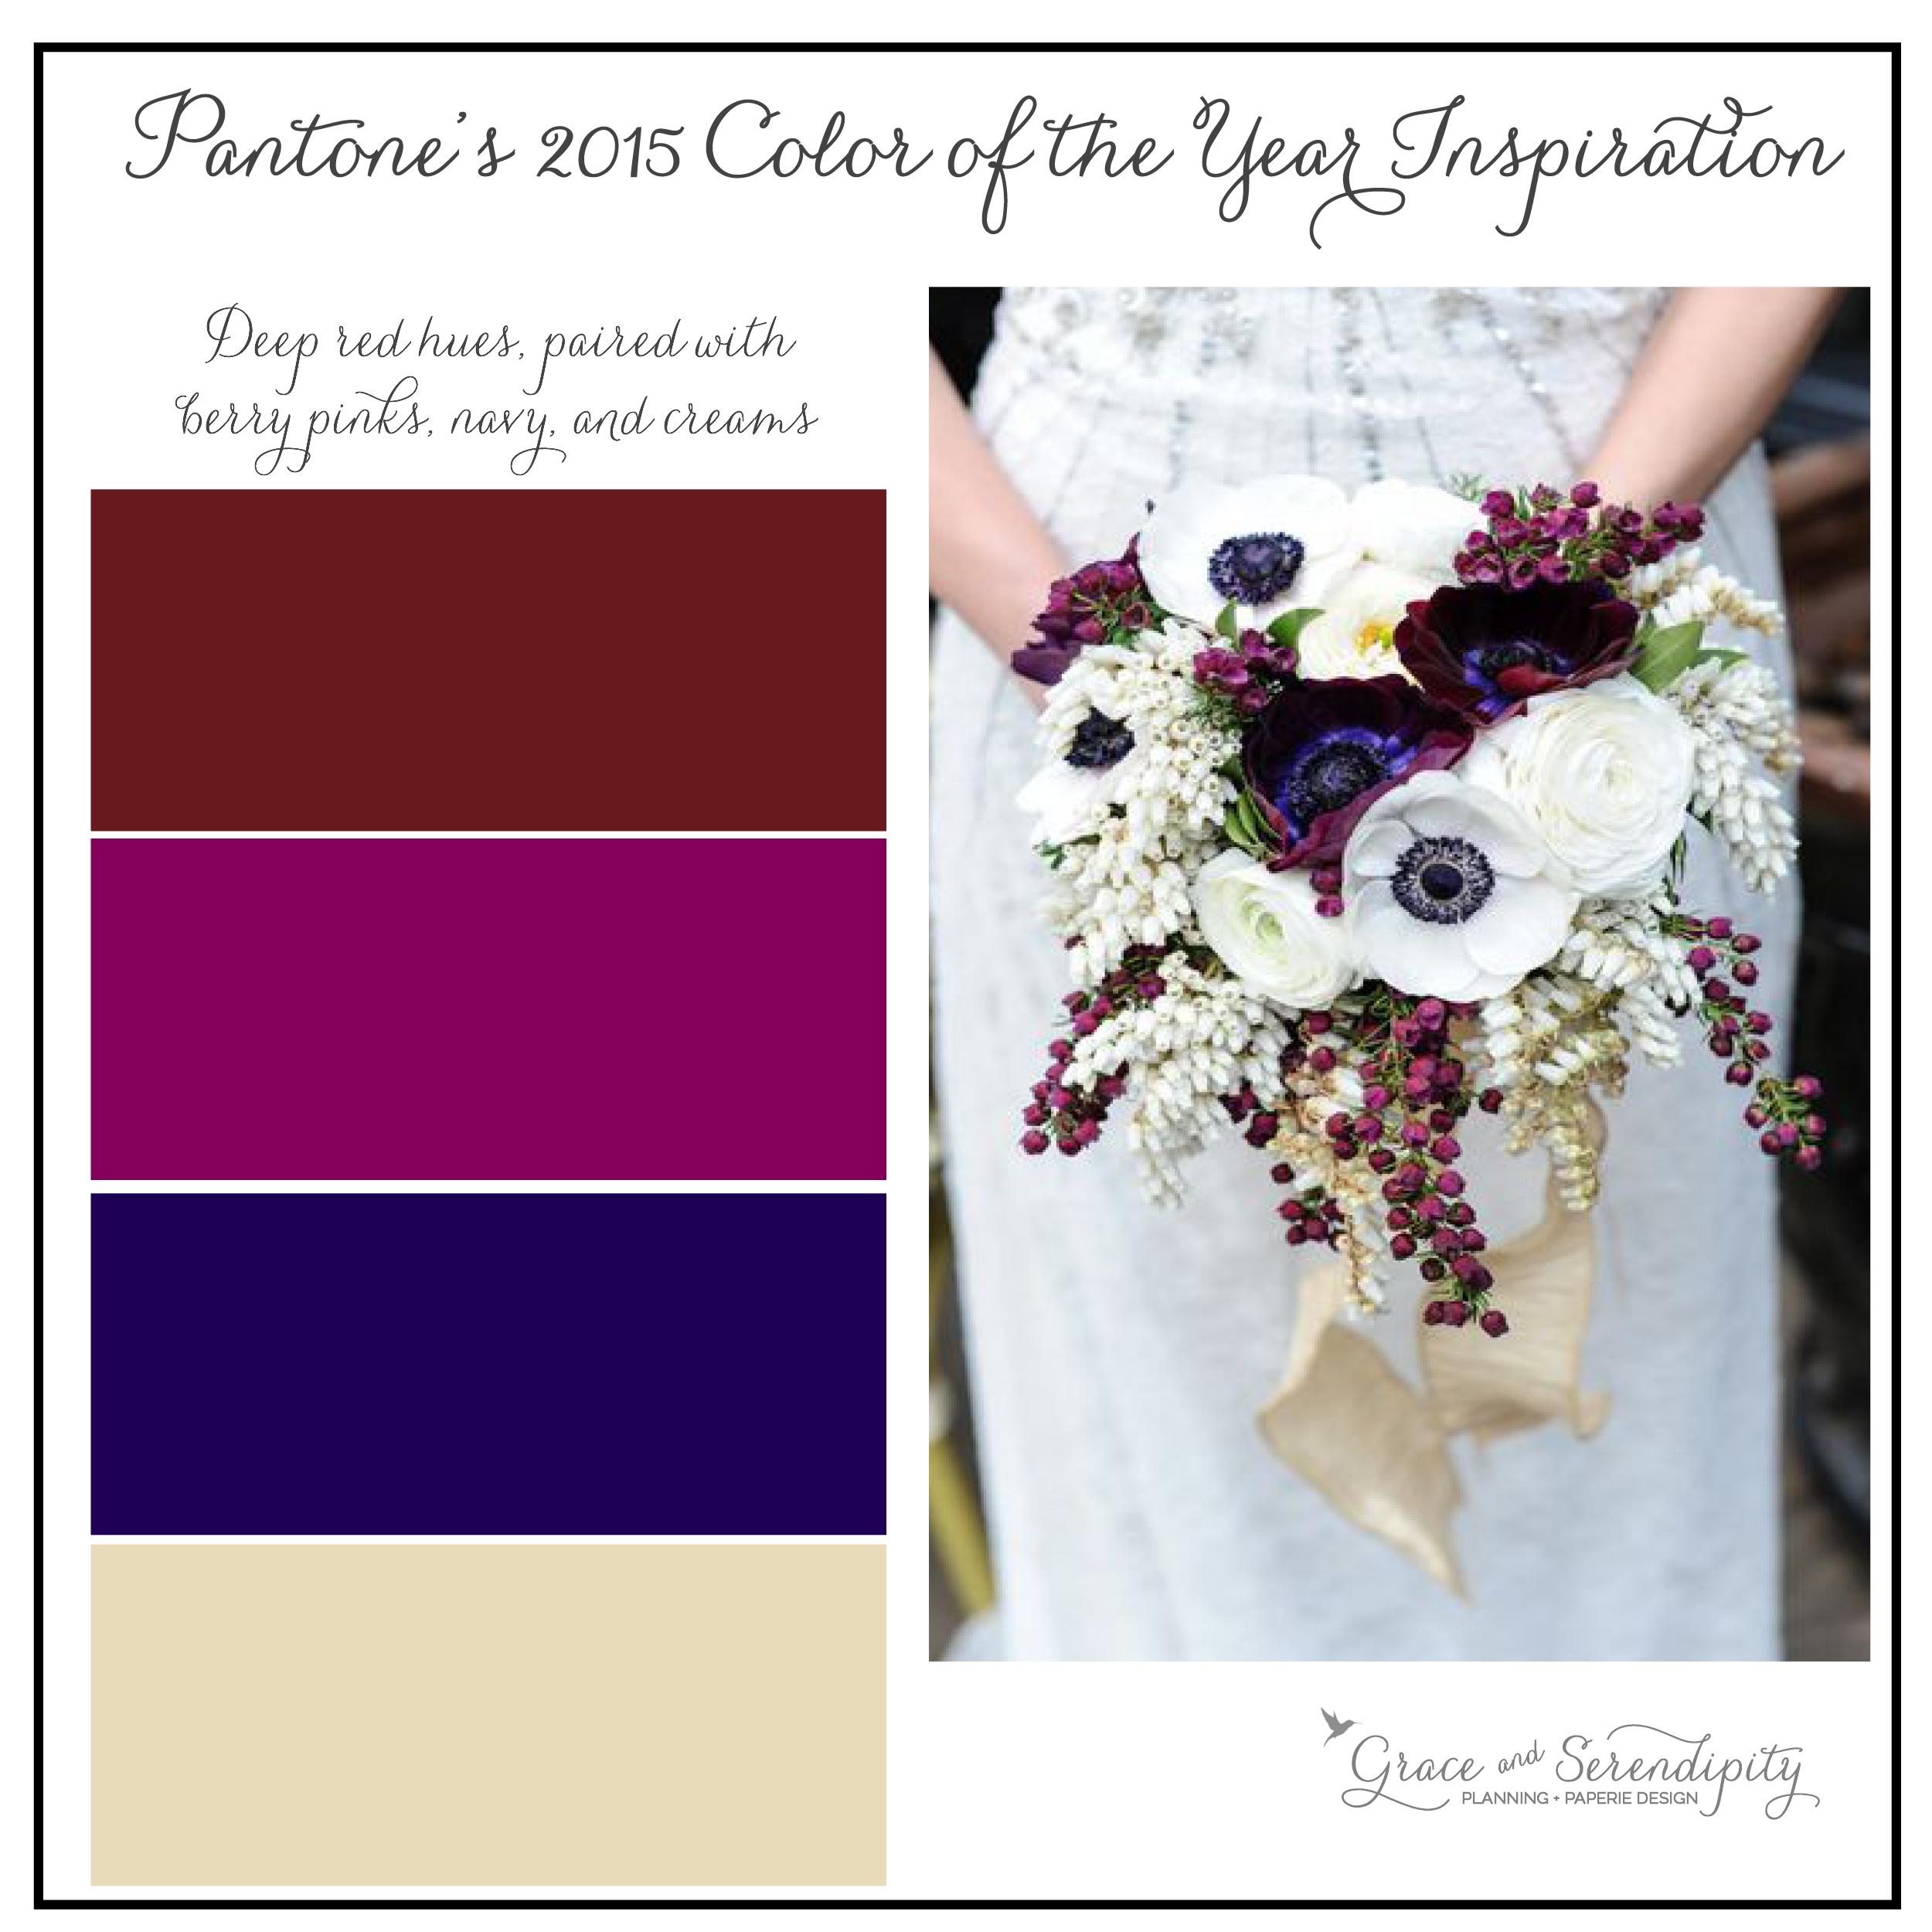 marsala inspiration board - burgundy, purple, navy, cream - grace and serendipity